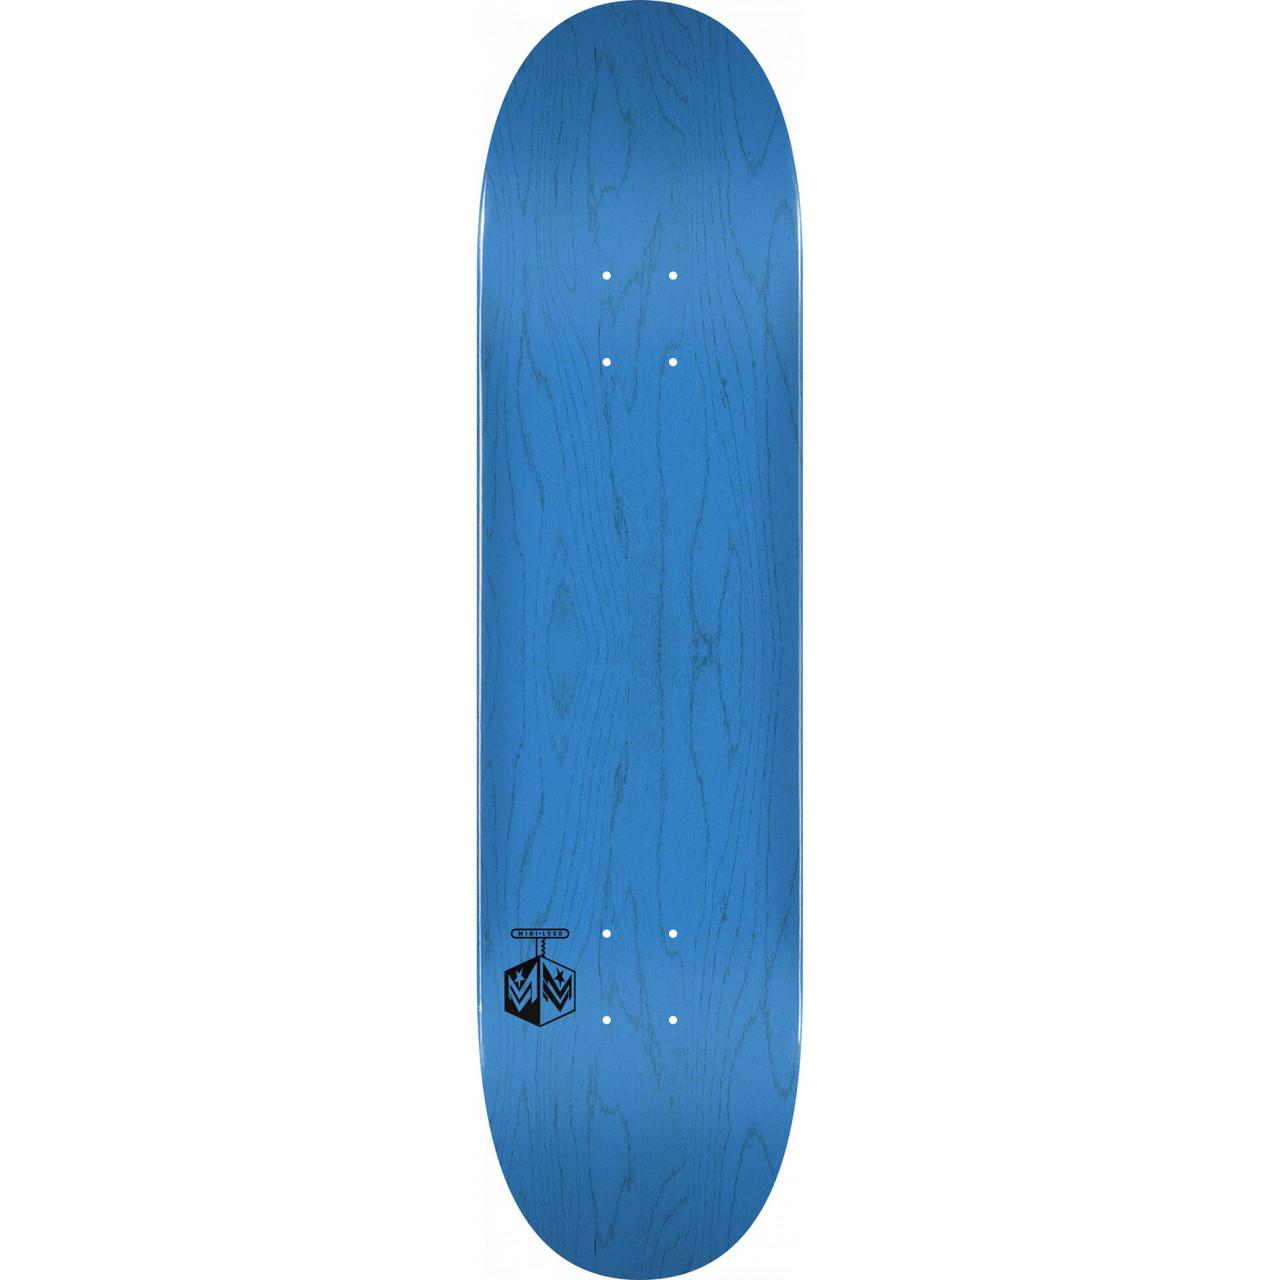 Mini-Logo Skateboard Deck K20 Chevron Detonator Blue 7.75 x 31.08 with Grip